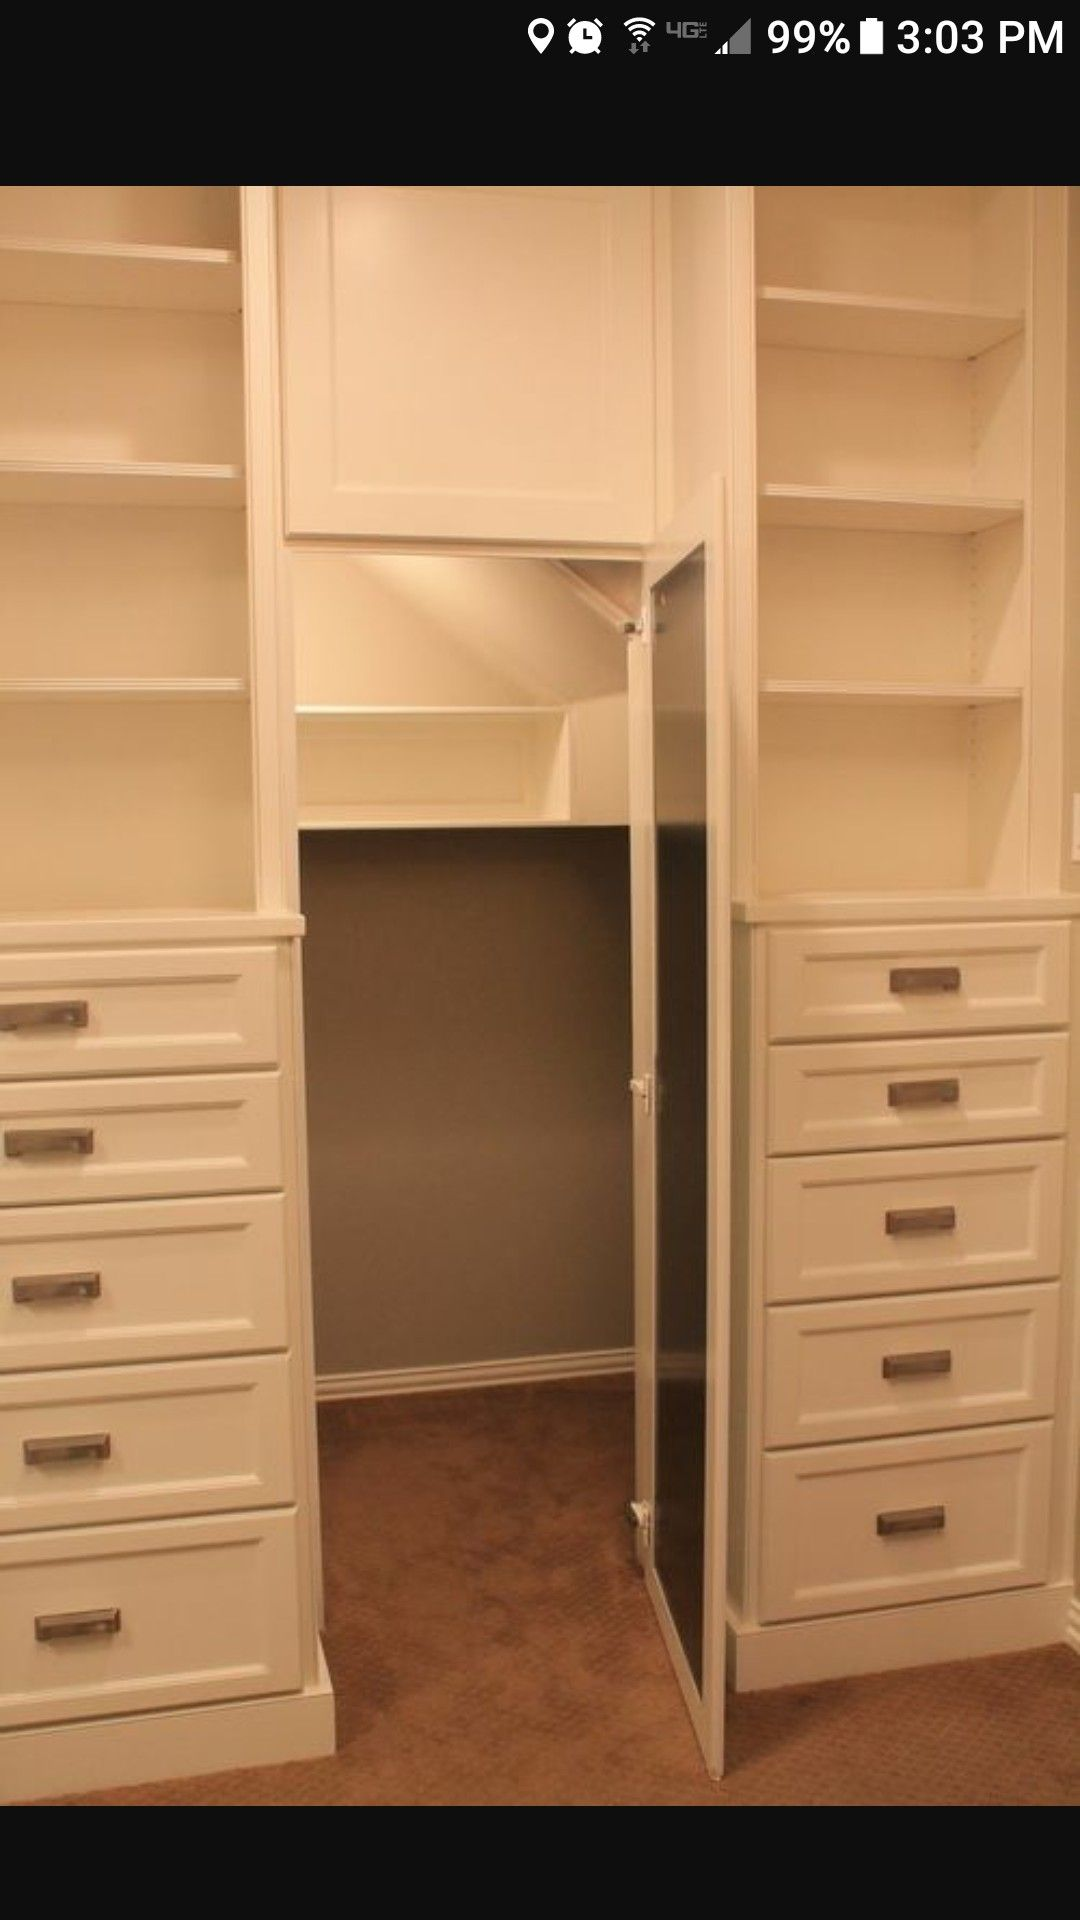 Secret compartment in closet good idea especially of u have a small